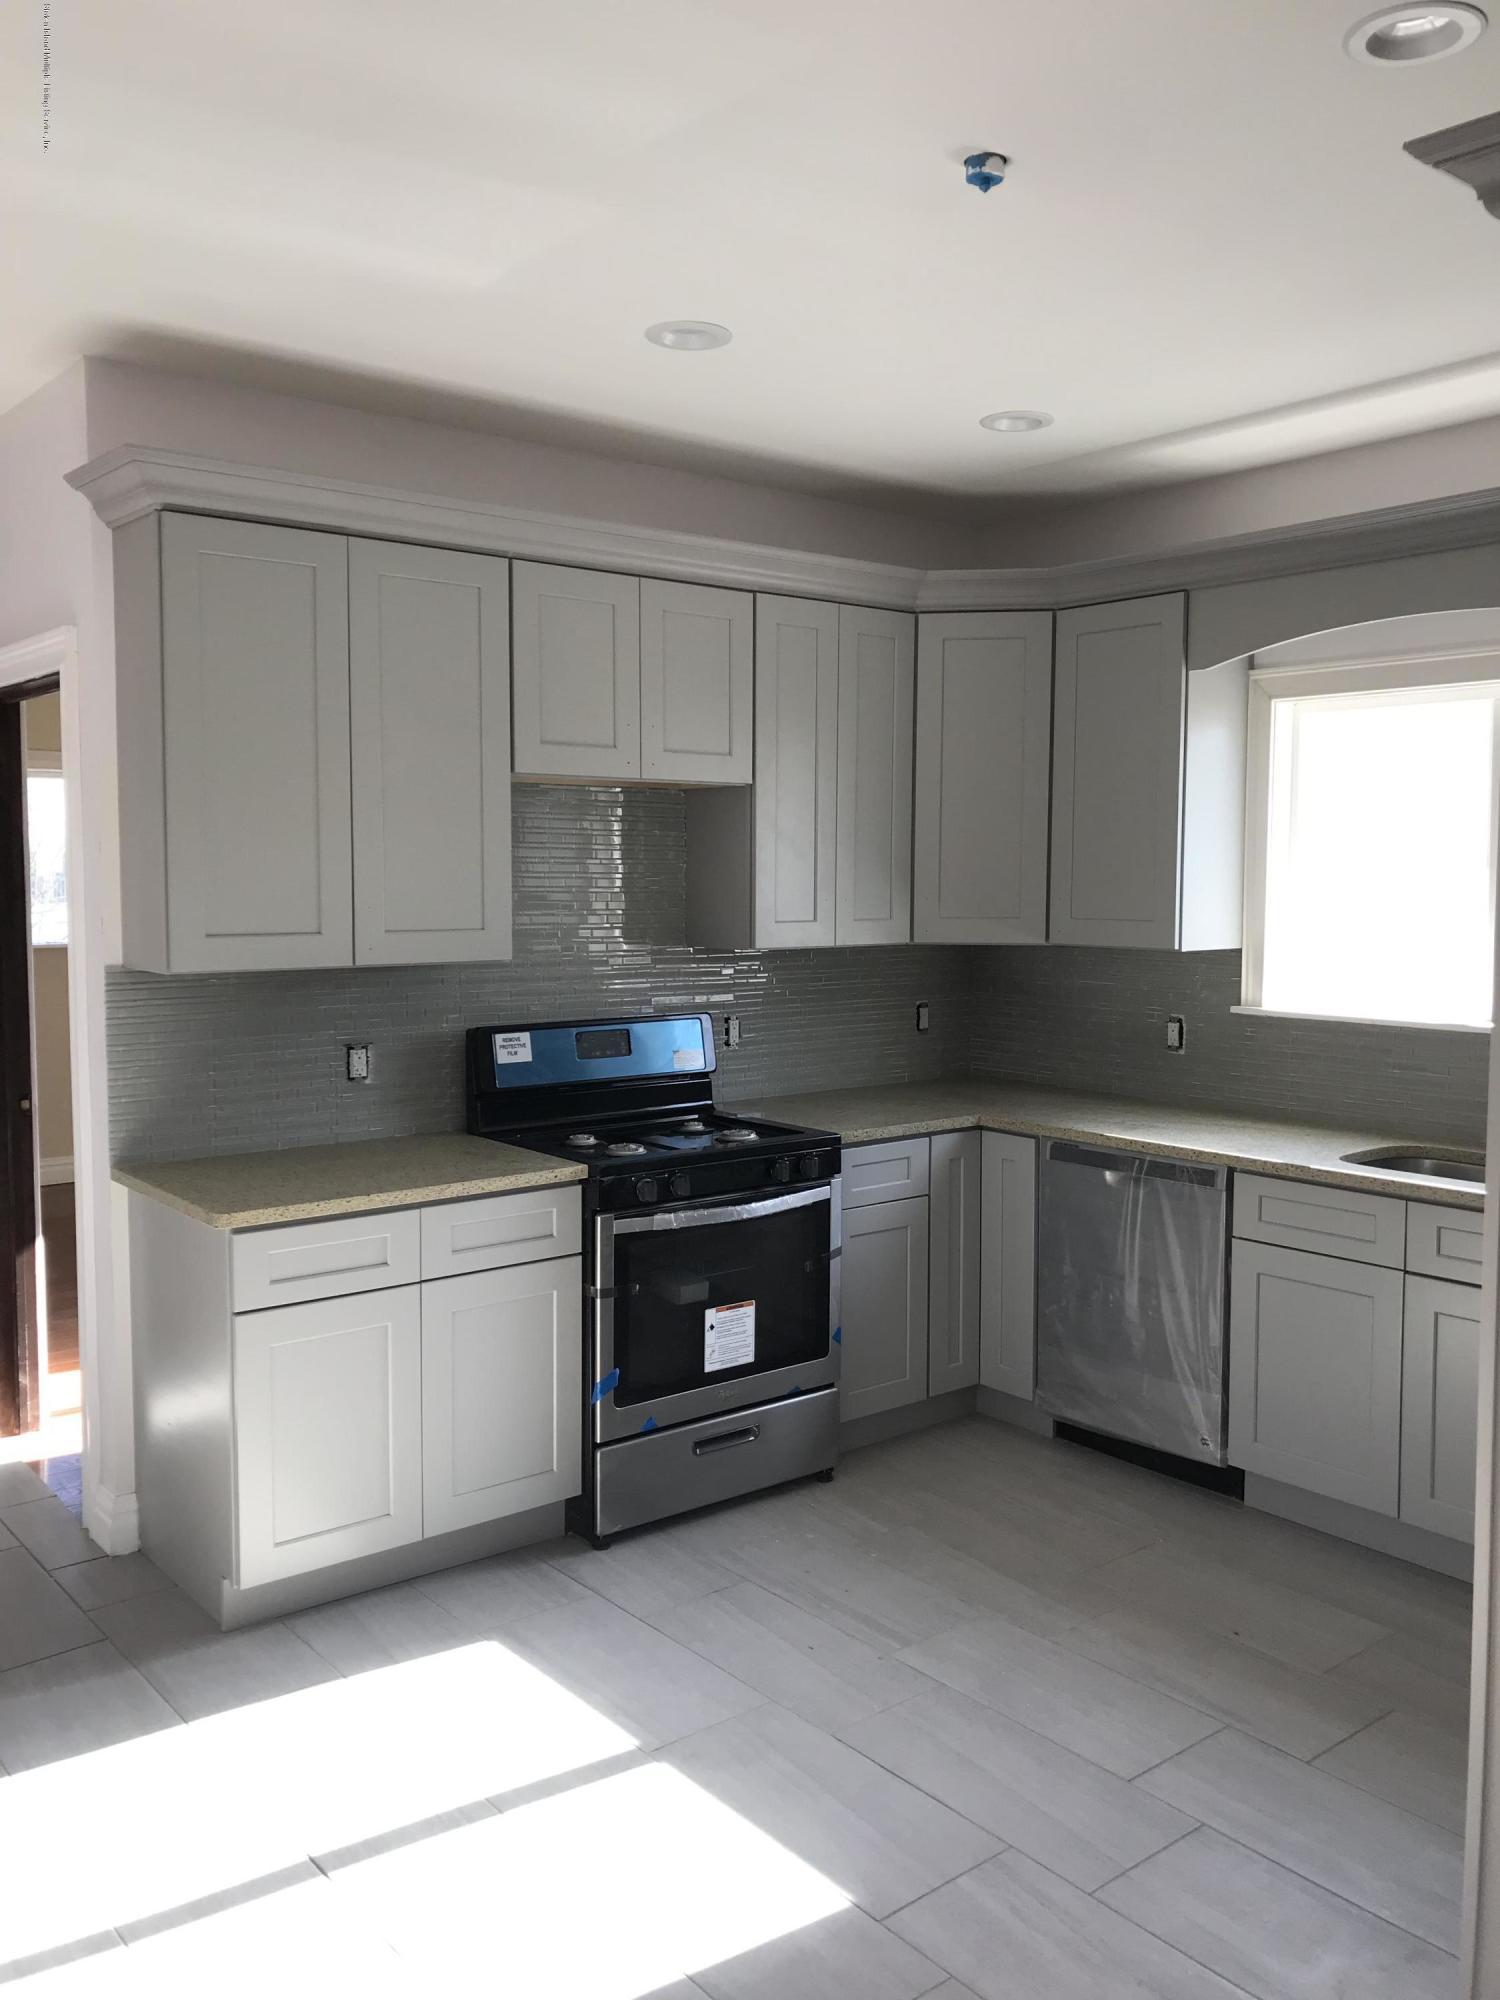 Two Family - Detached 120 Pemberton Avenue  Staten Island, NY 10308, MLS-1124929-3